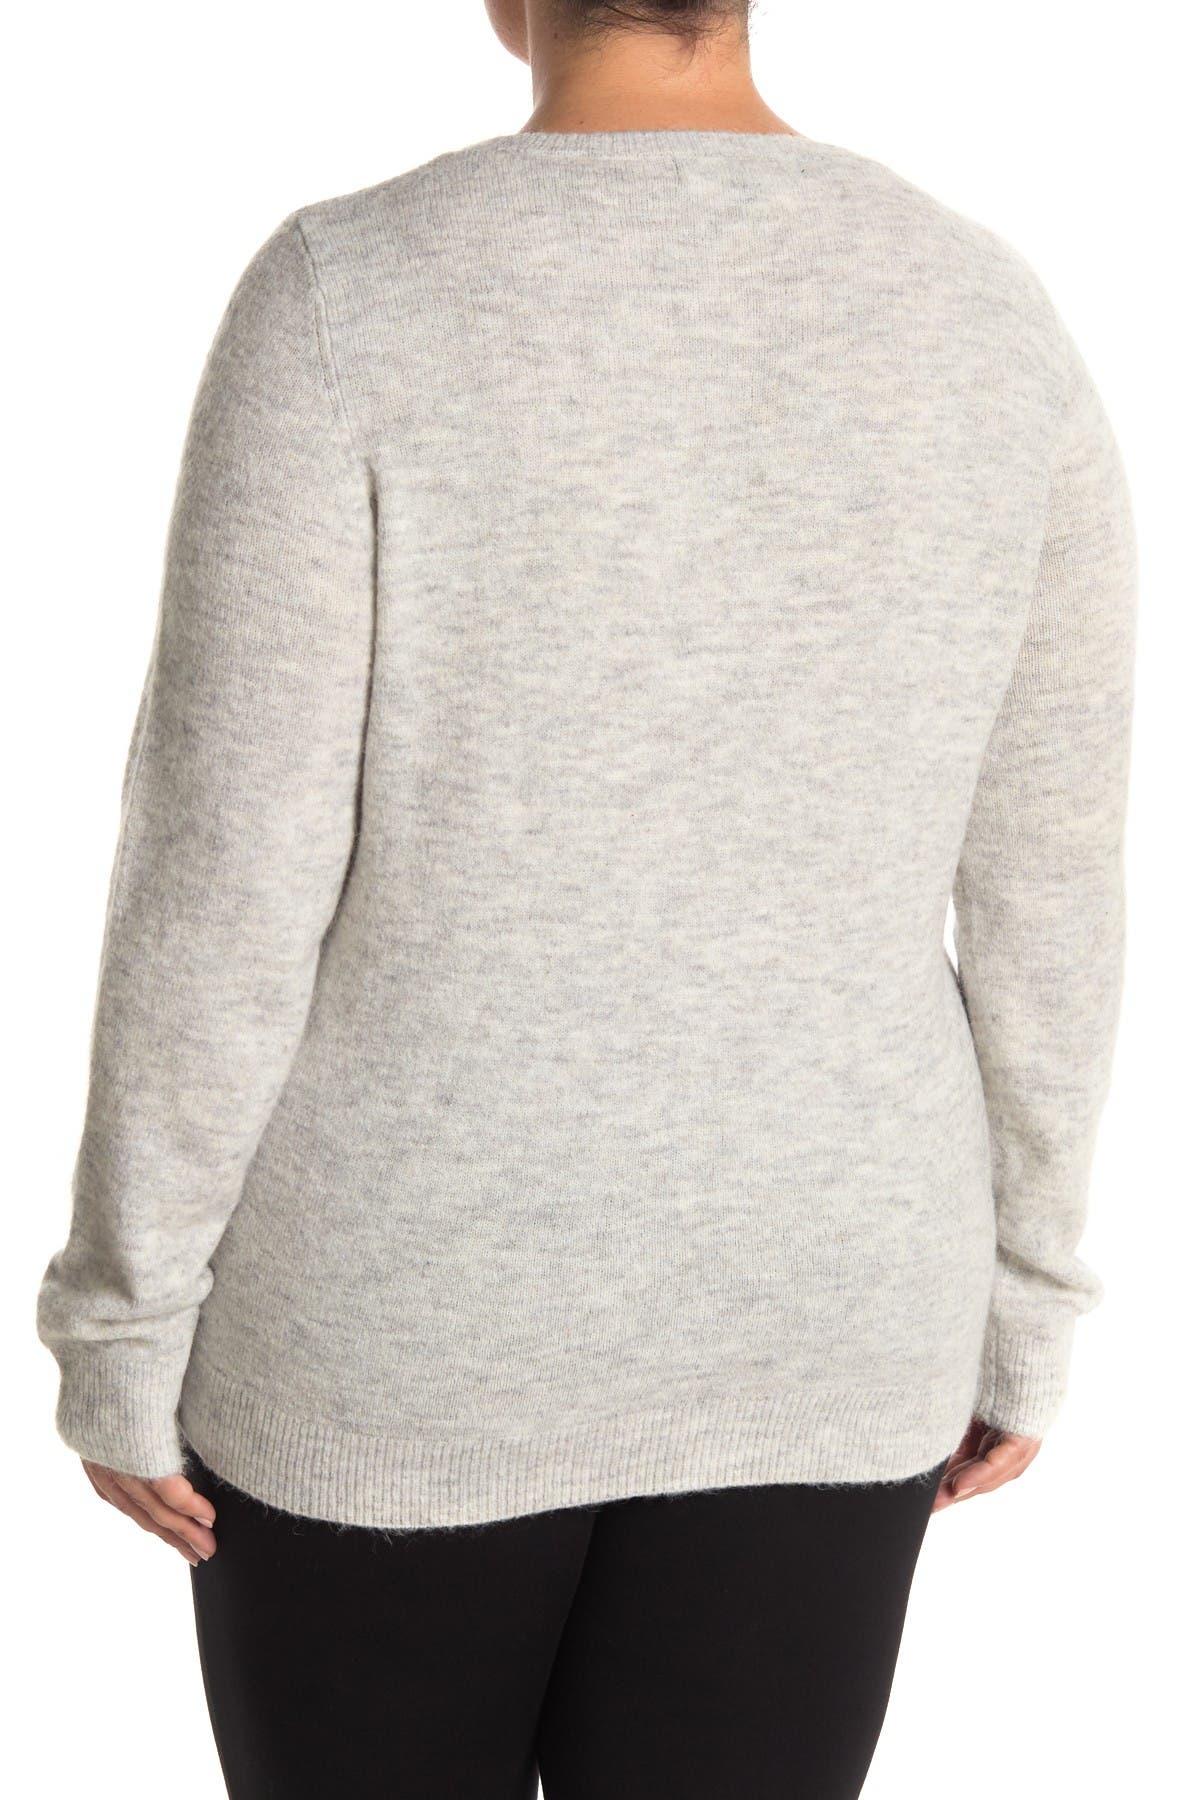 Image of VERO MODA Long Sleeve V-Neck Lace Trim Sweater